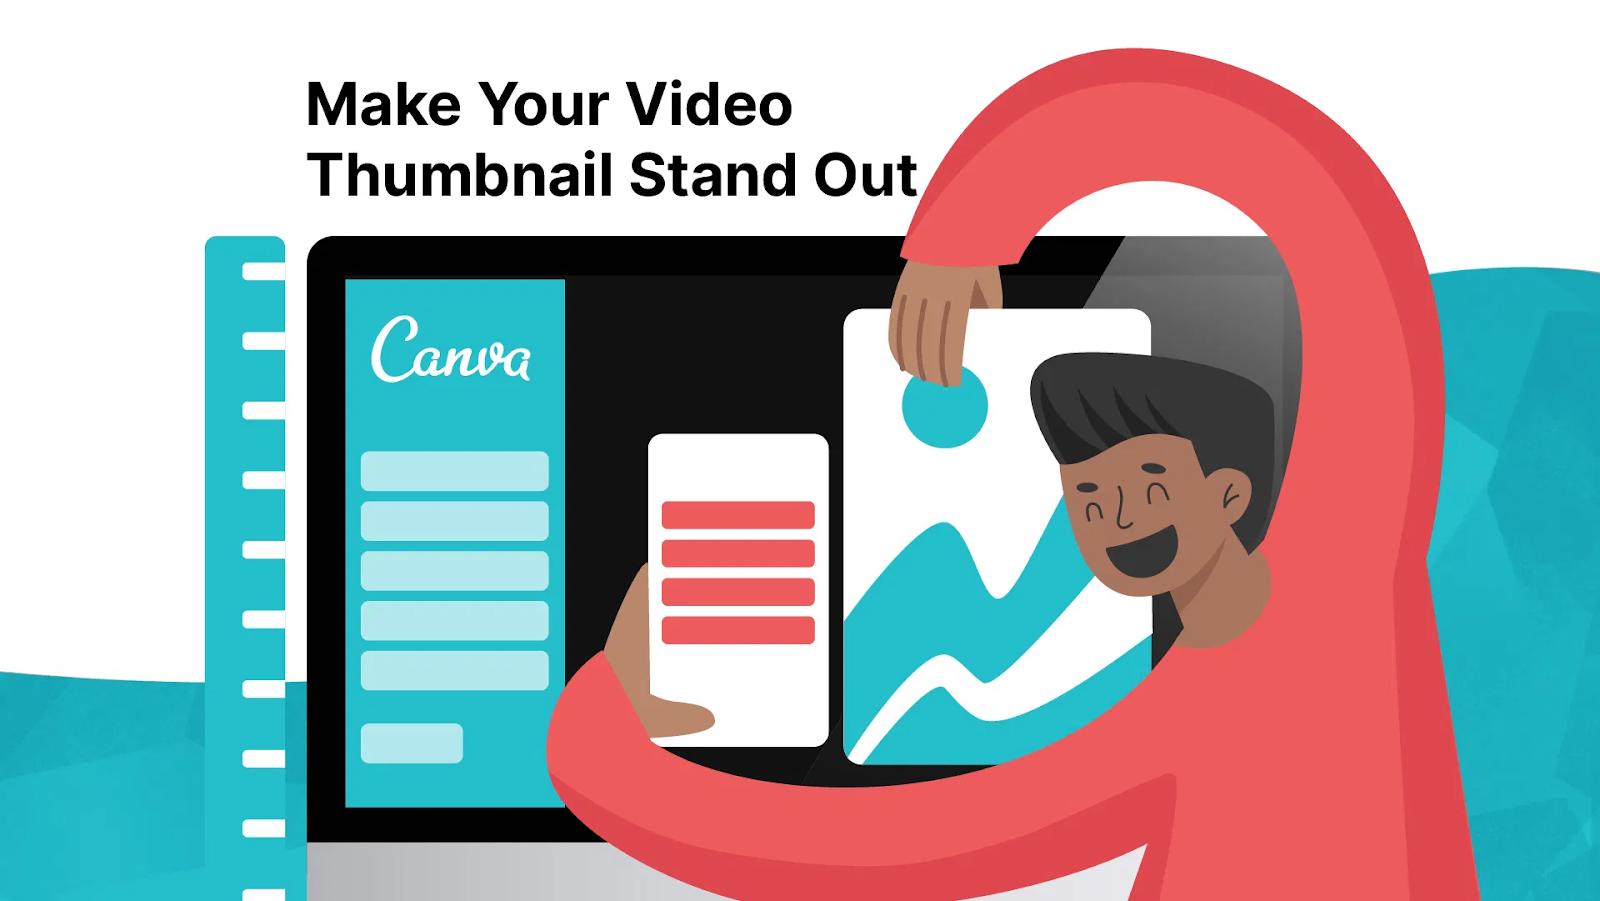 YouTube Marketing Plan Thumbnail https://thedigitalmarketinginstitute.org/